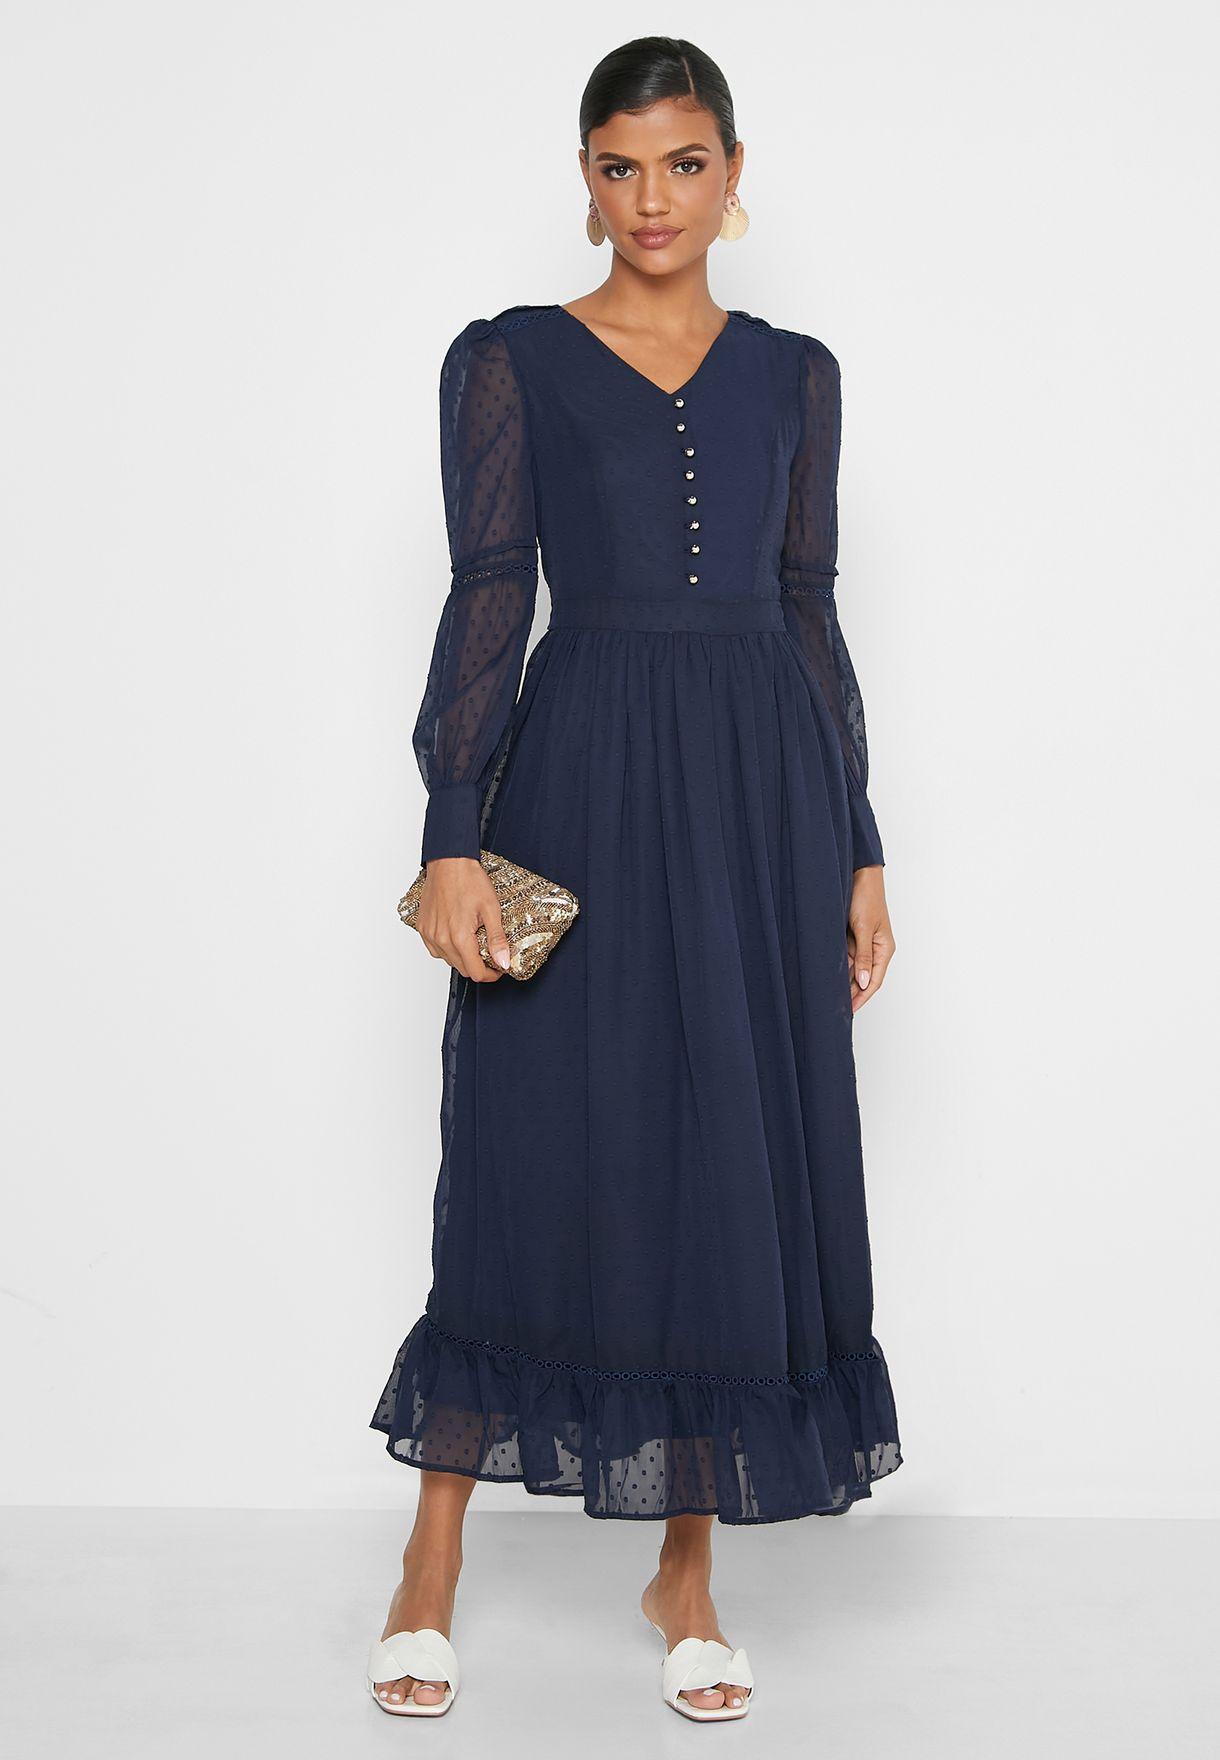 Textured Smock Dress